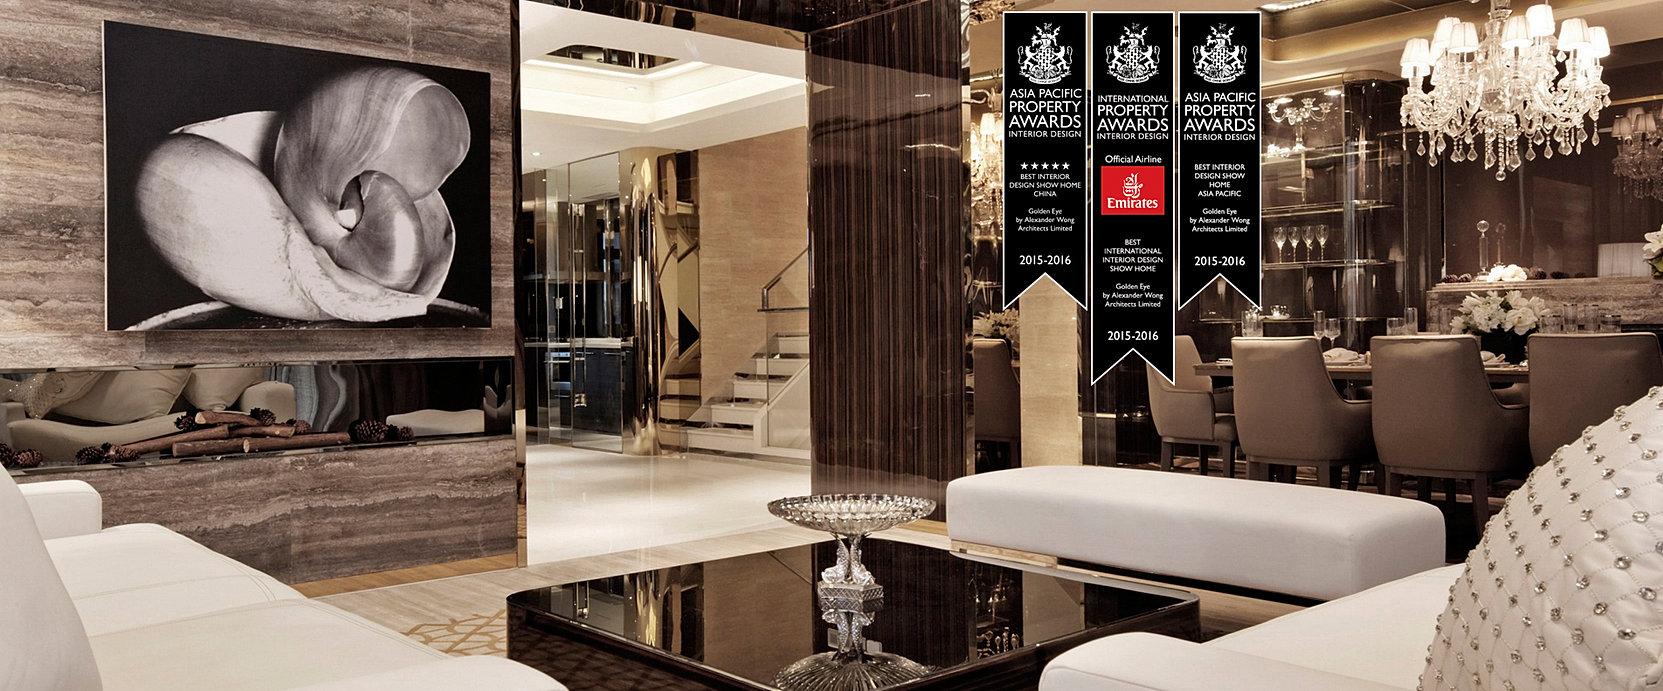 Alexander wong architects awards winning interior design for International interior designers